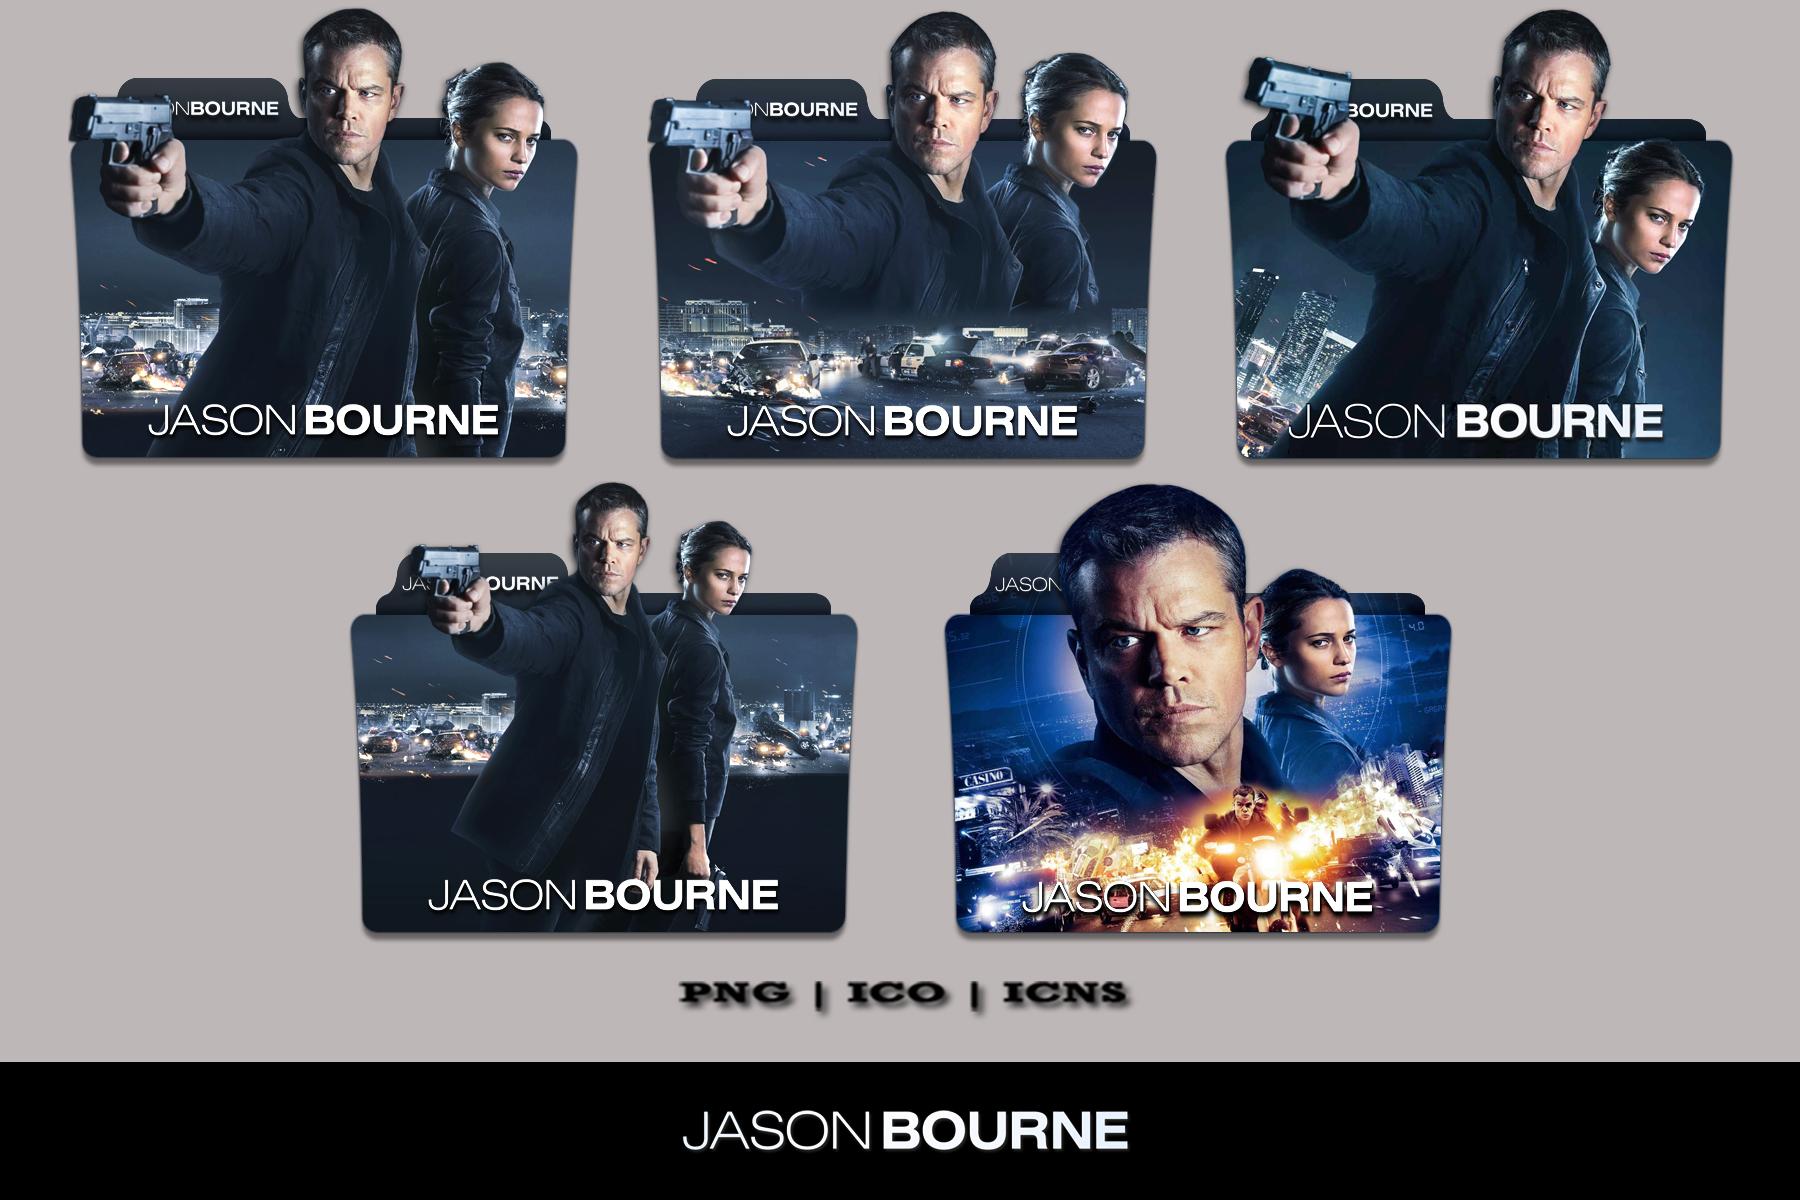 Jason Bourne 2016 Folder Icon Pack By Bl4cksl4yer On Deviantart